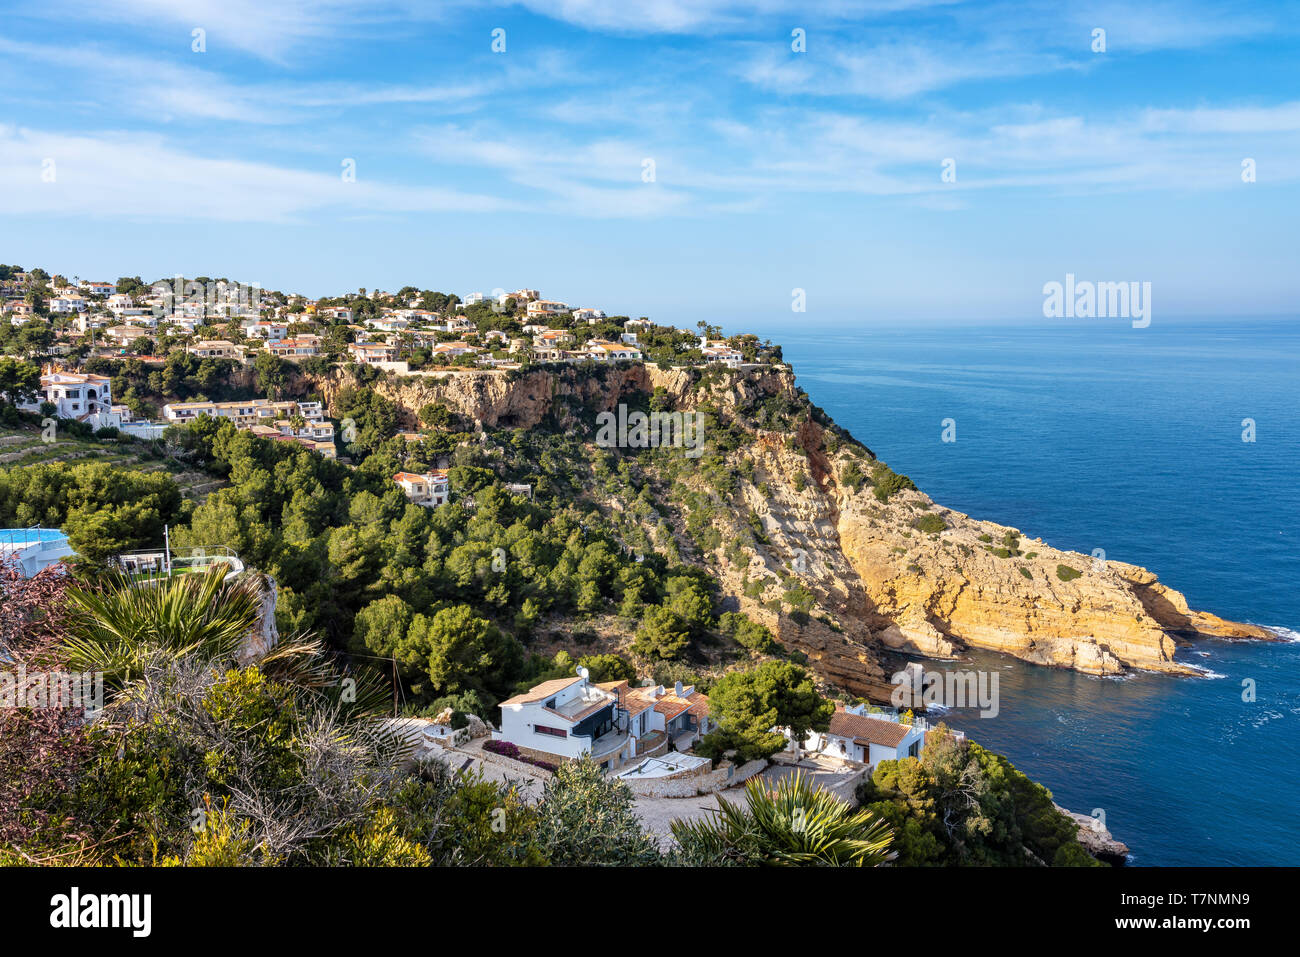 Cap de la Nau, Nao cape in Xabia Javea near Alicante Spain - Stock Image